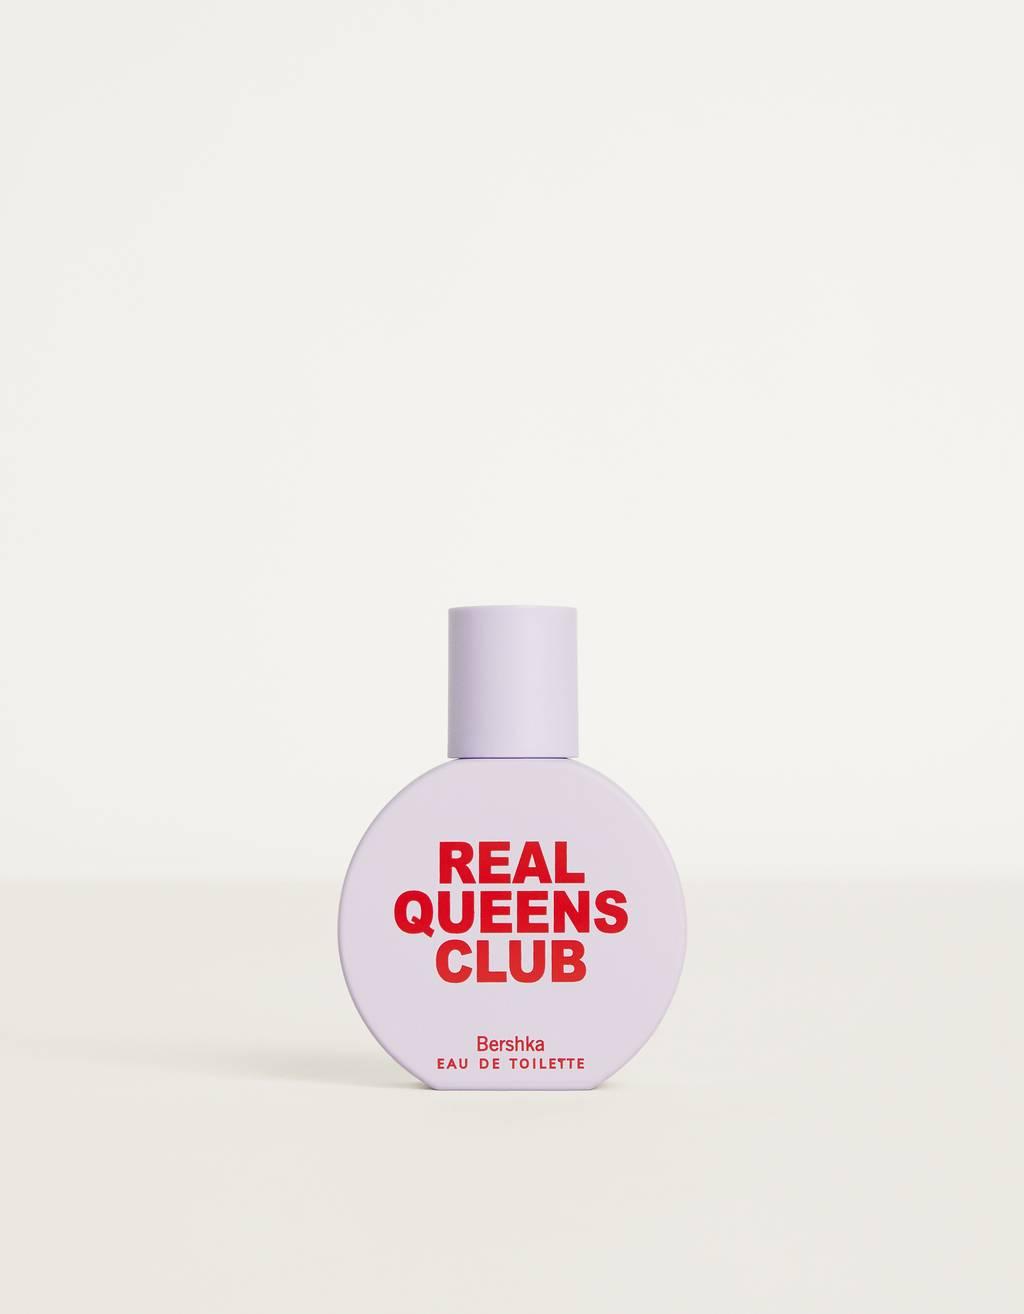 Auga de tocador Real queens club